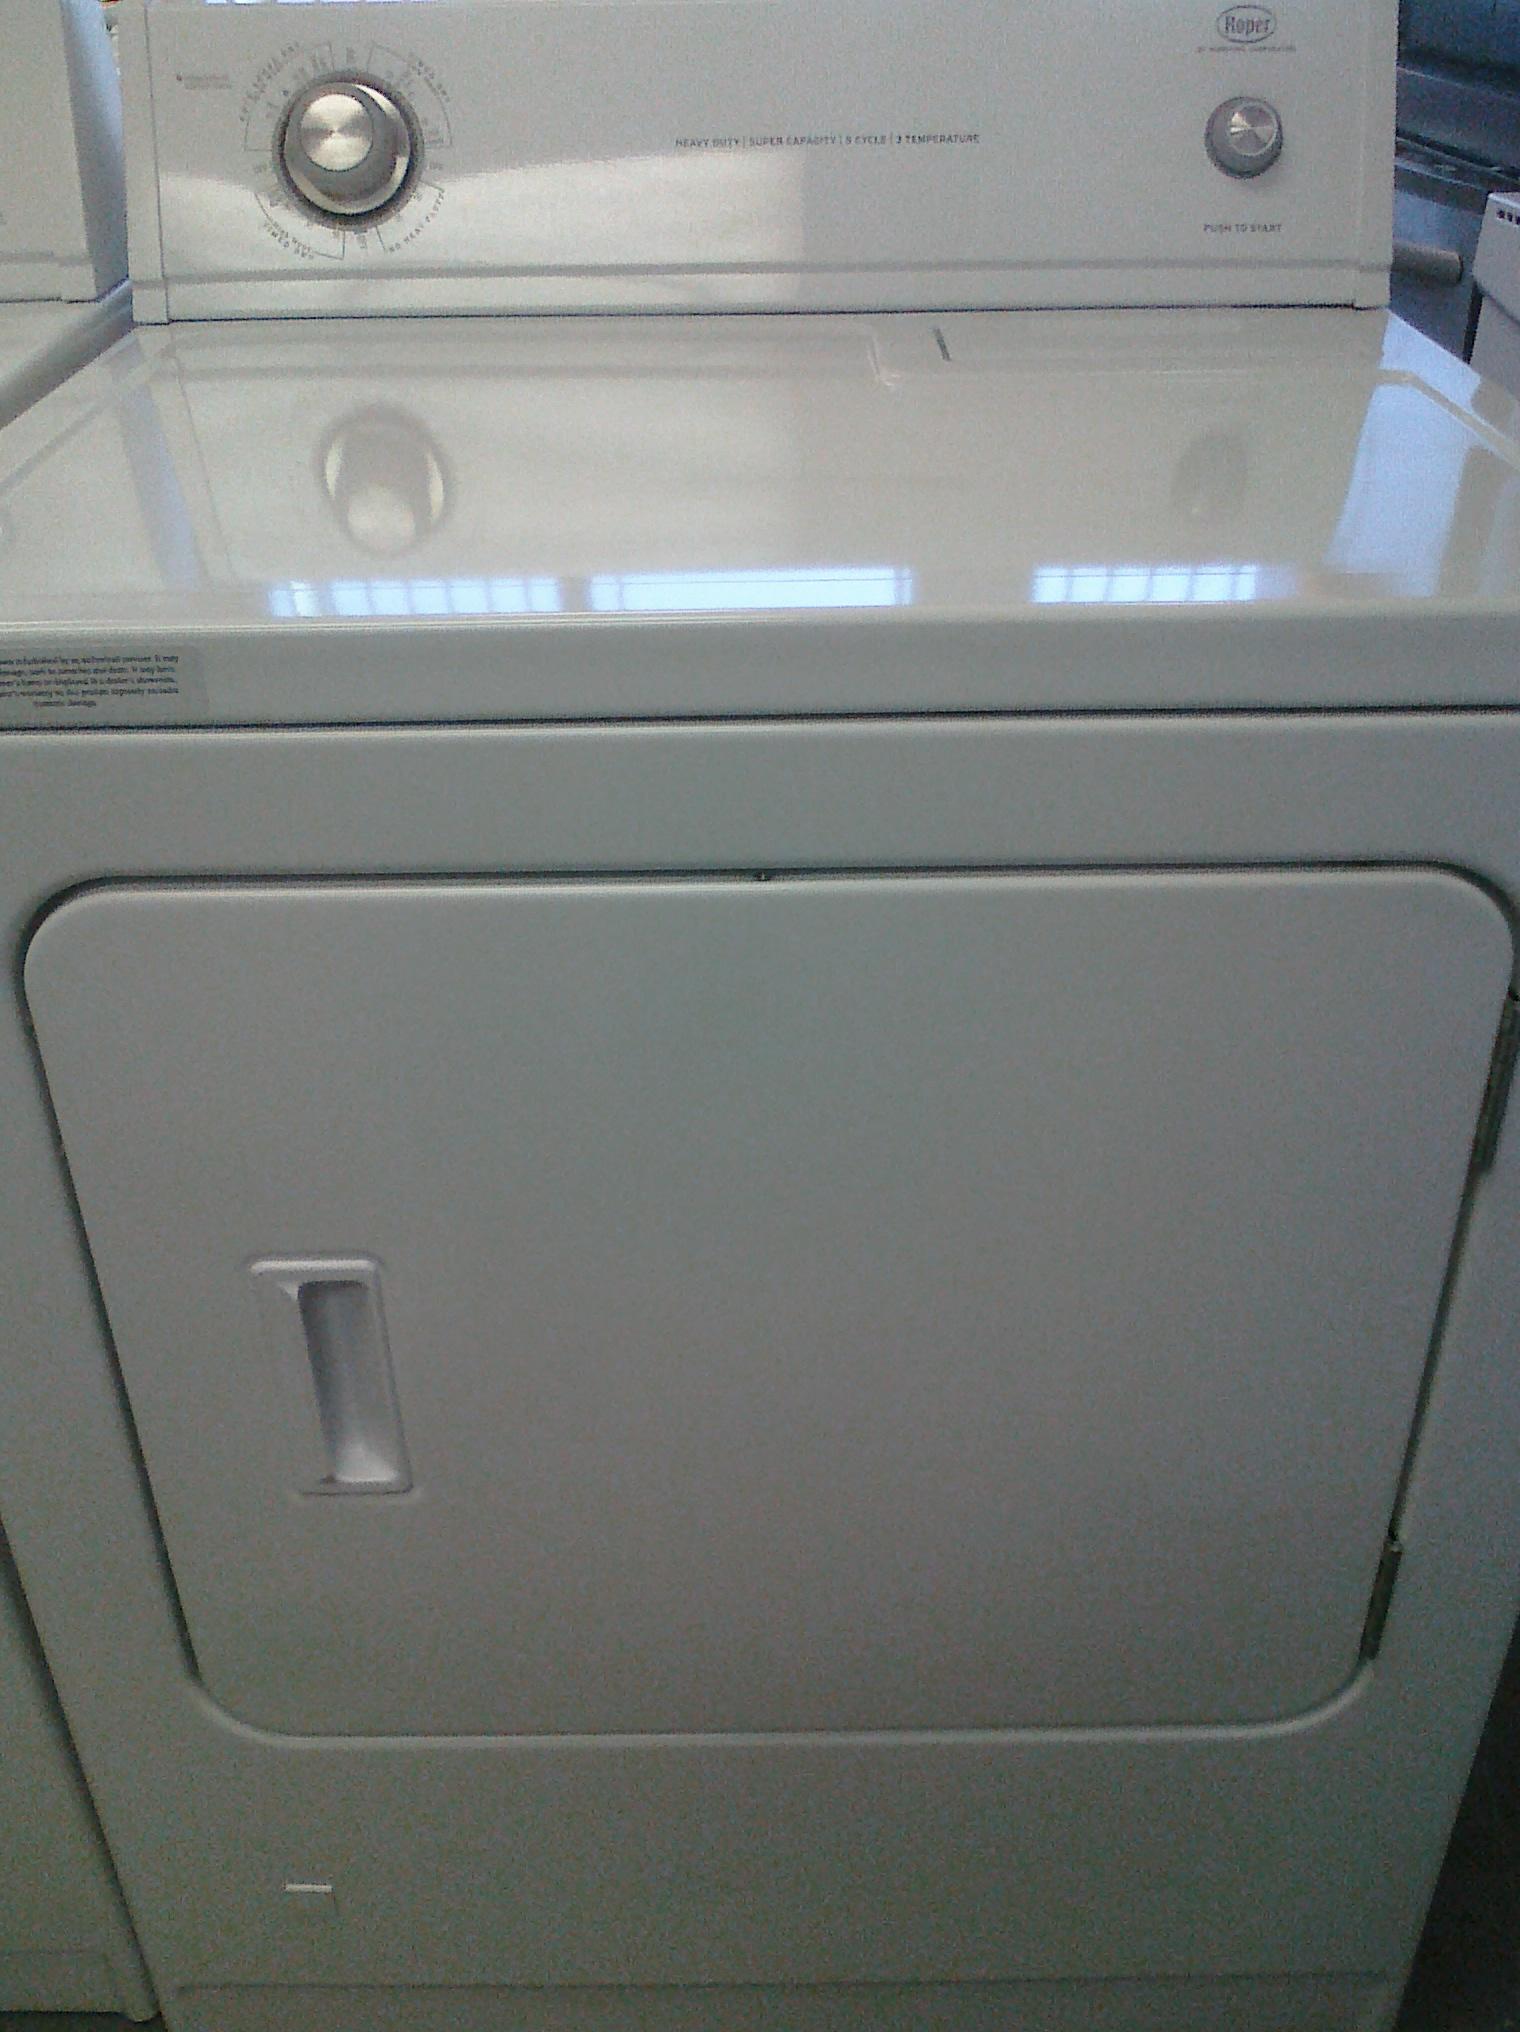 9 Roper Rgd4440vq Gas Dryer White Feder S Outlet